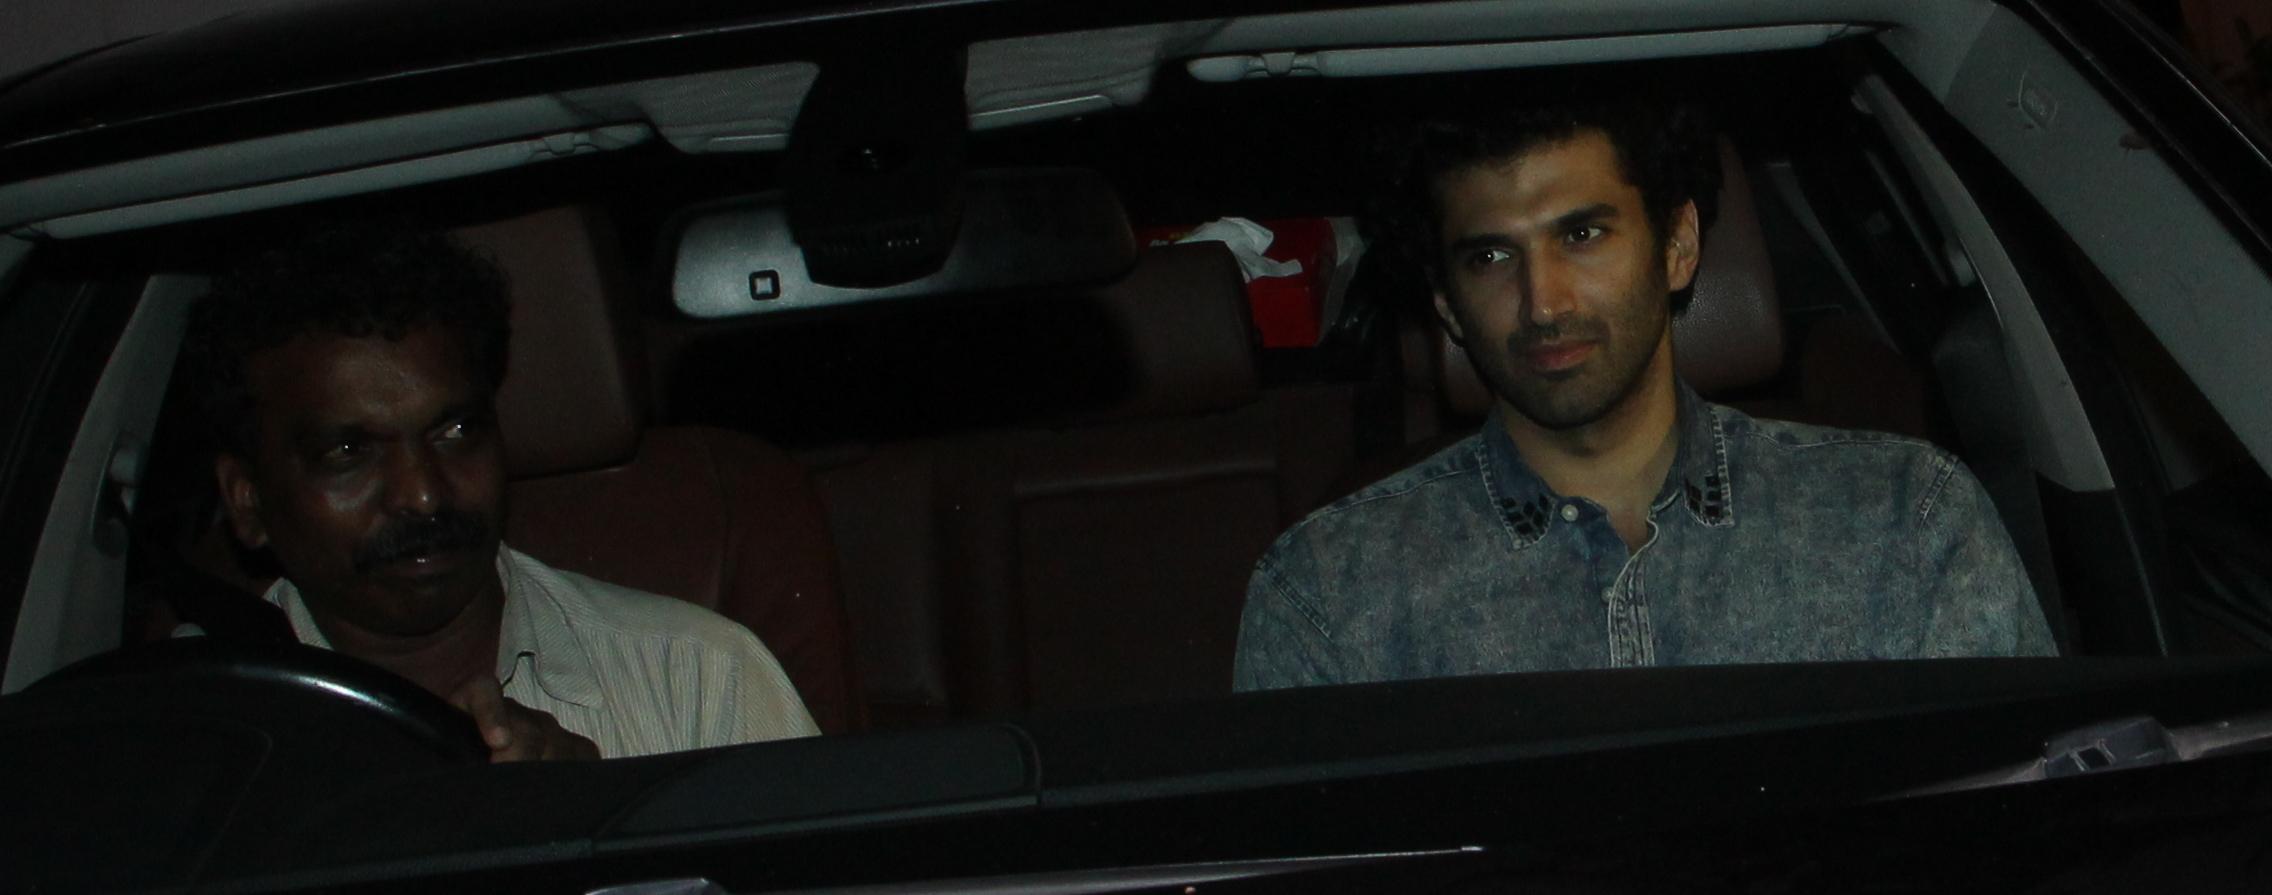 Aditya Roy Kapoor at Karan Johar's Party